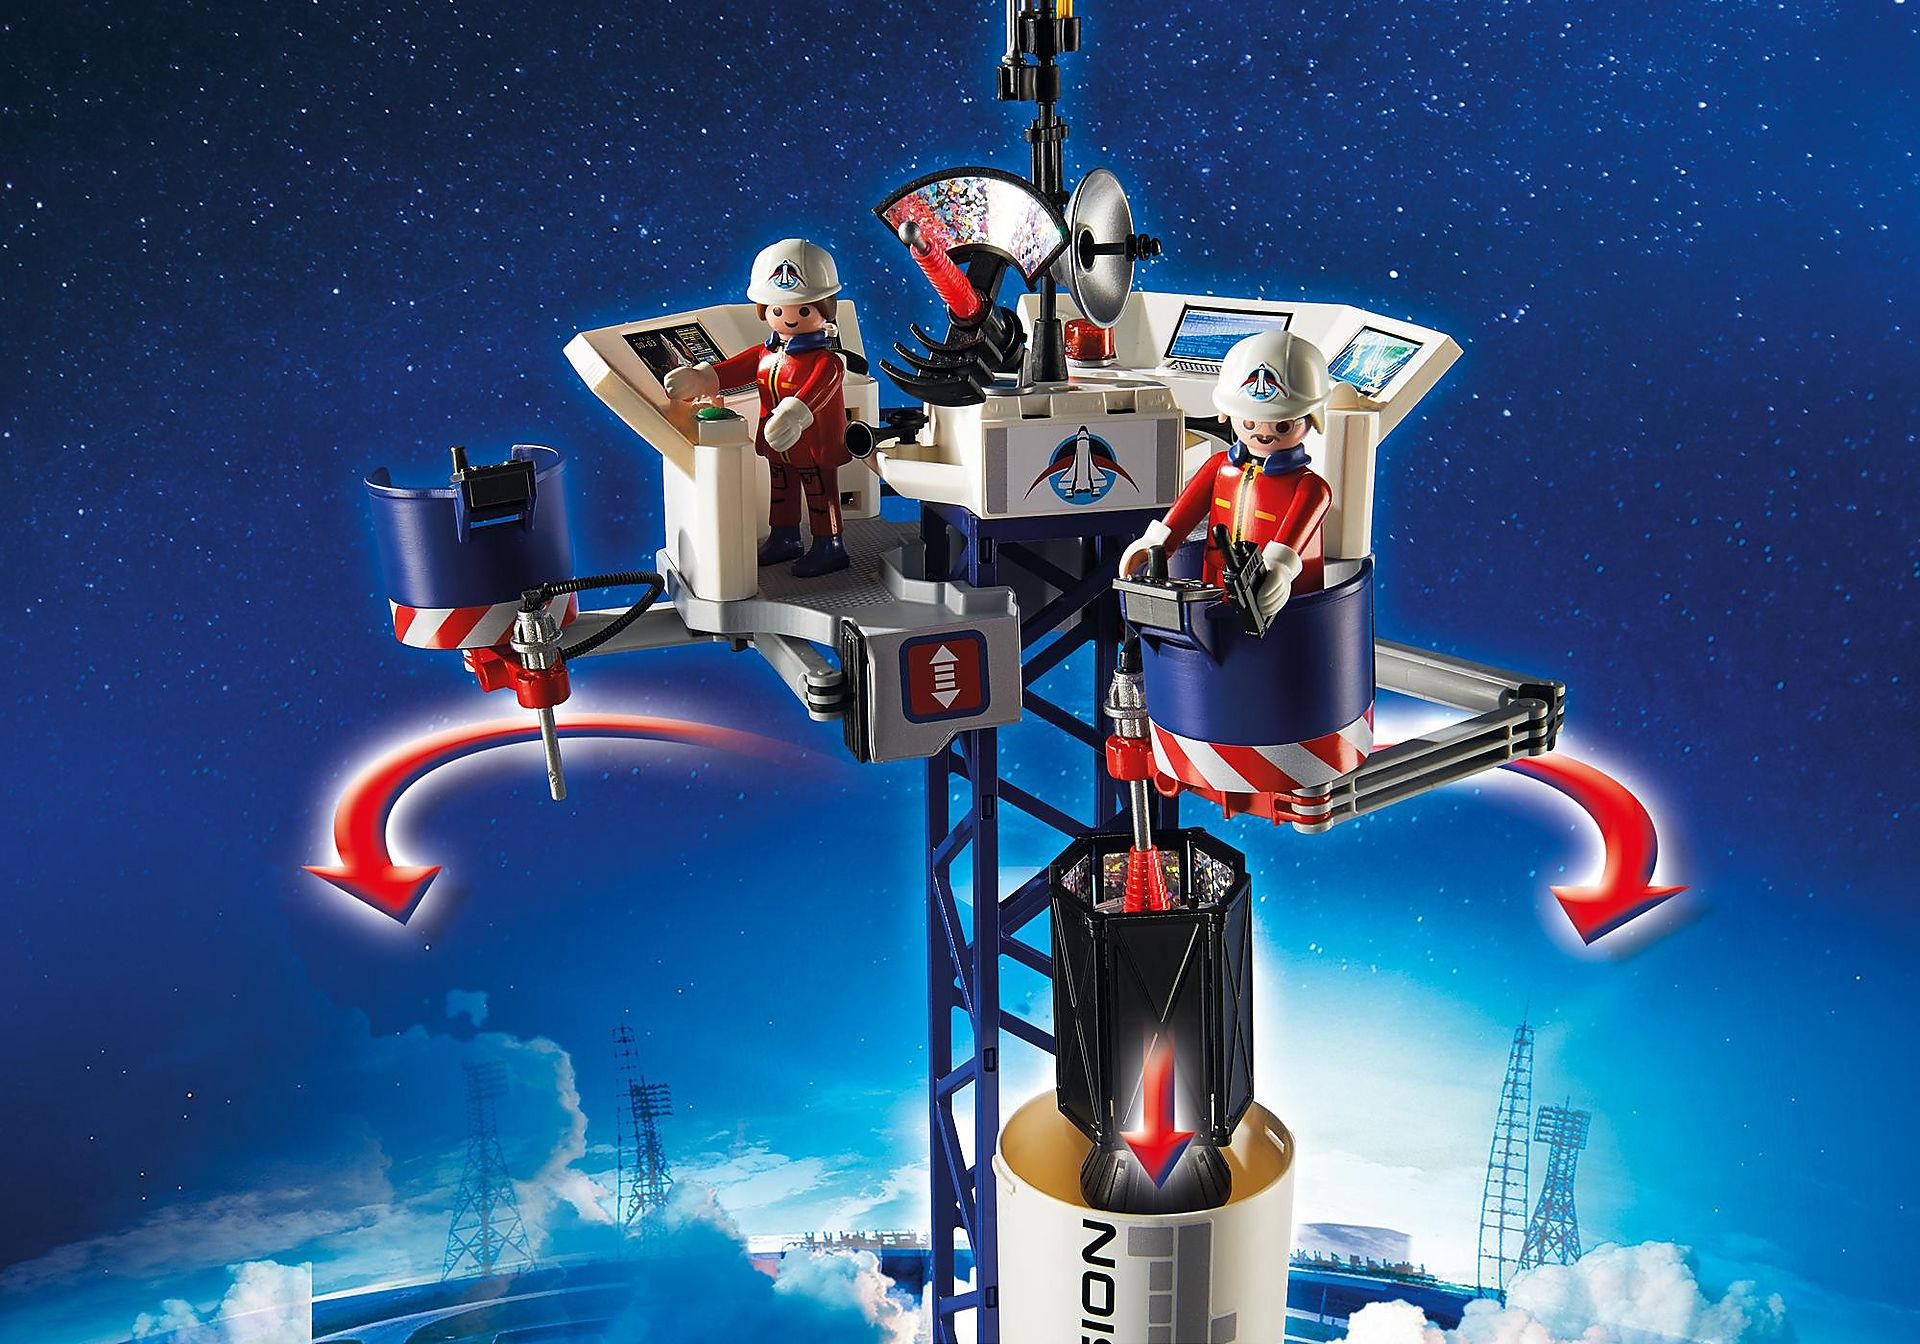 http://media.playmobil.com/i/playmobil/6195_product_extra1/Cohete con Plataforma de Lanzamiento